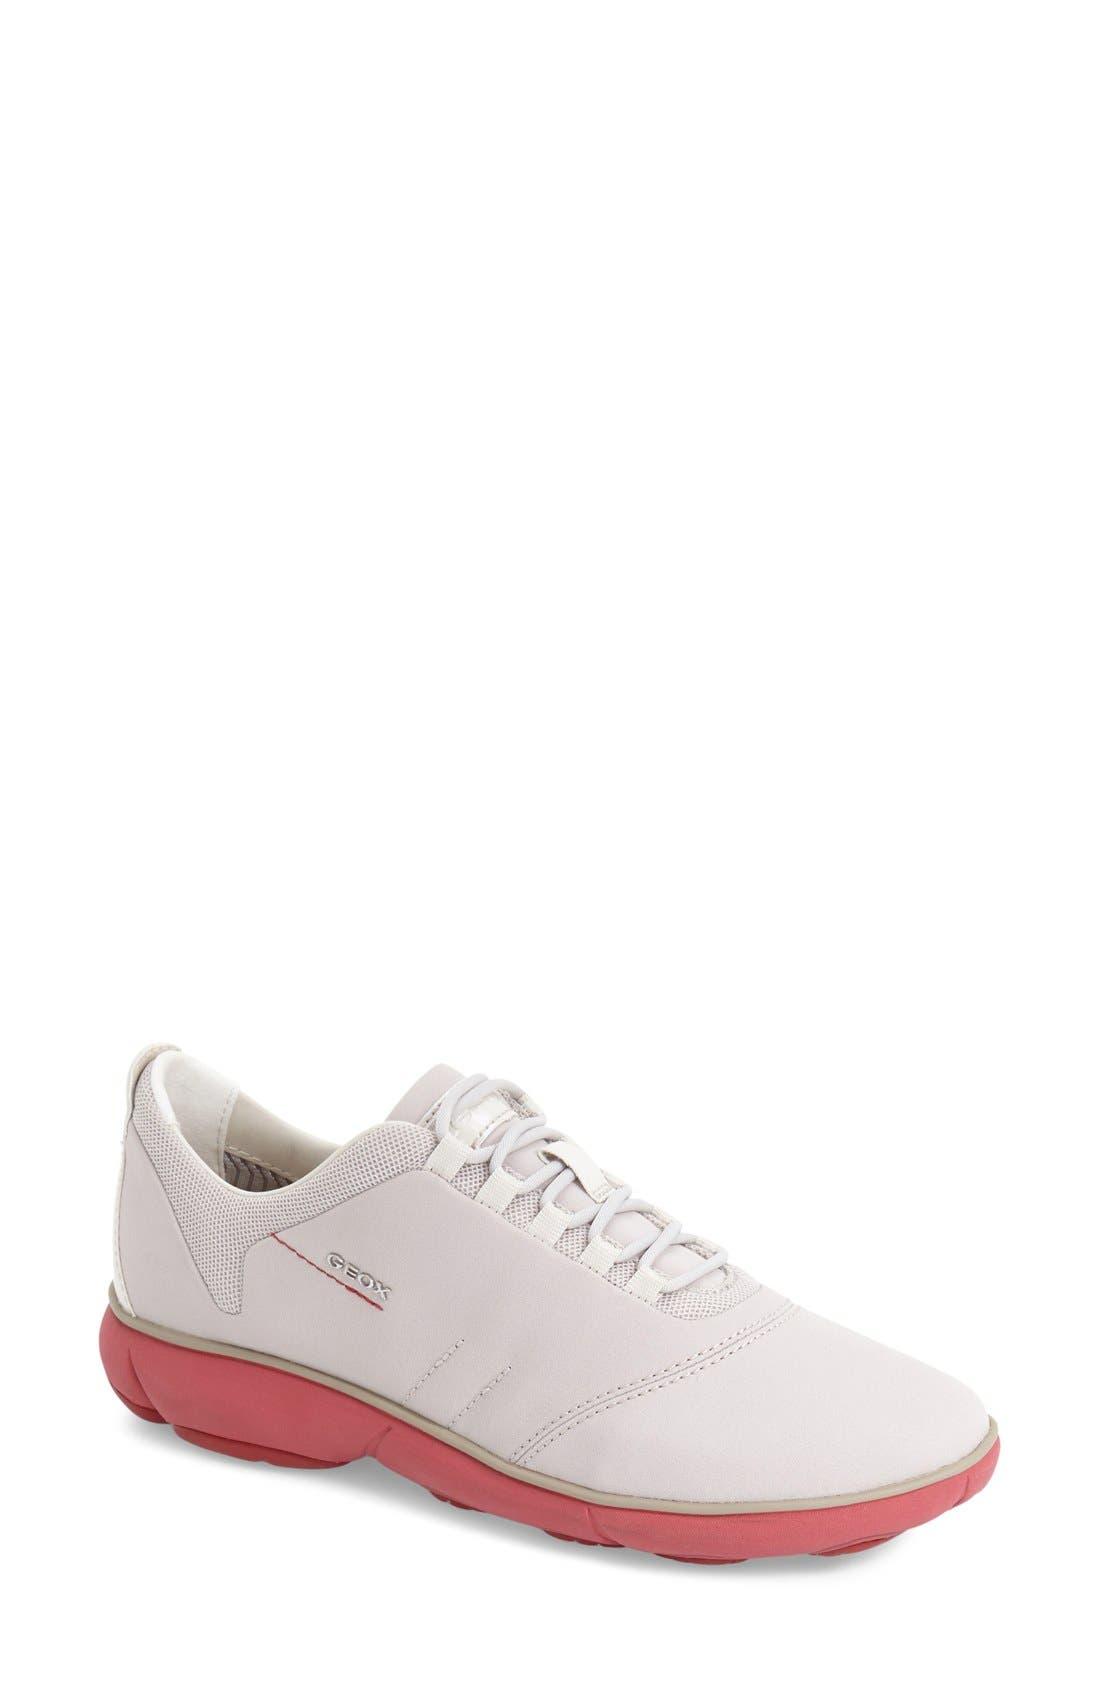 Nebula Slip-On Sneaker,                             Main thumbnail 10, color,